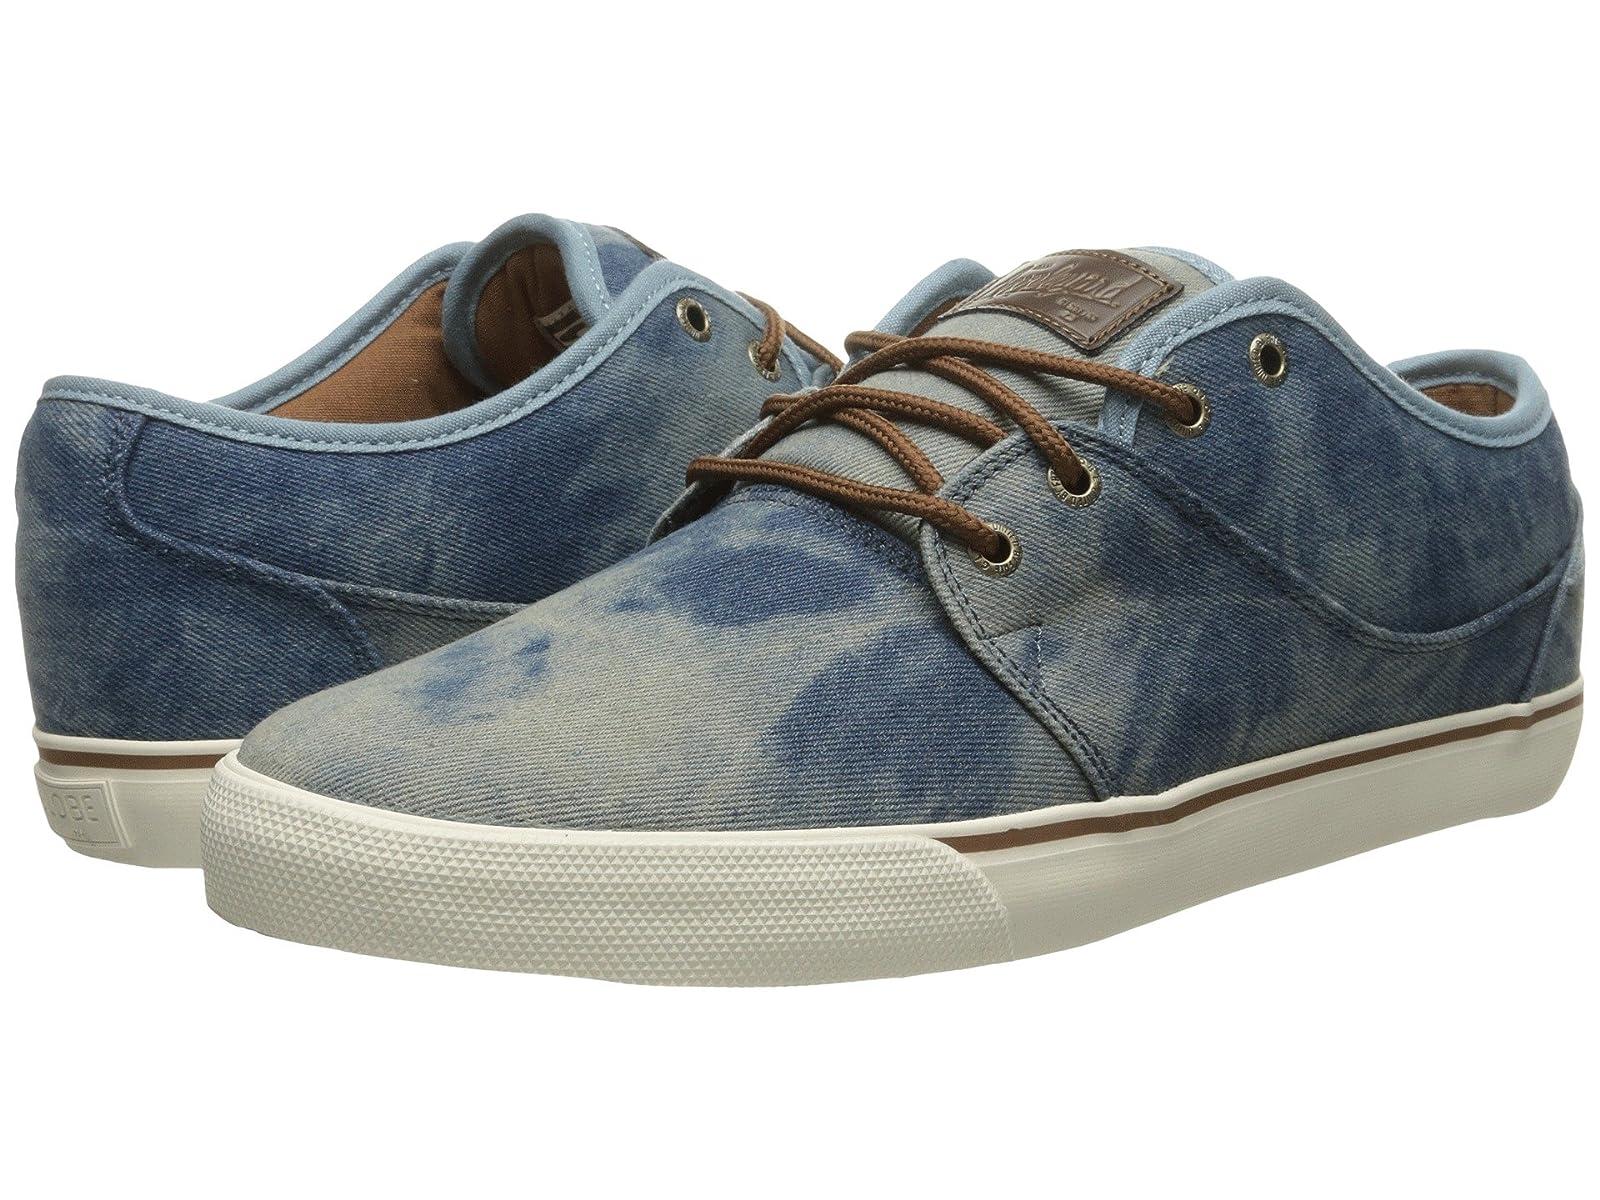 Globe MahaloCheap and distinctive eye-catching shoes